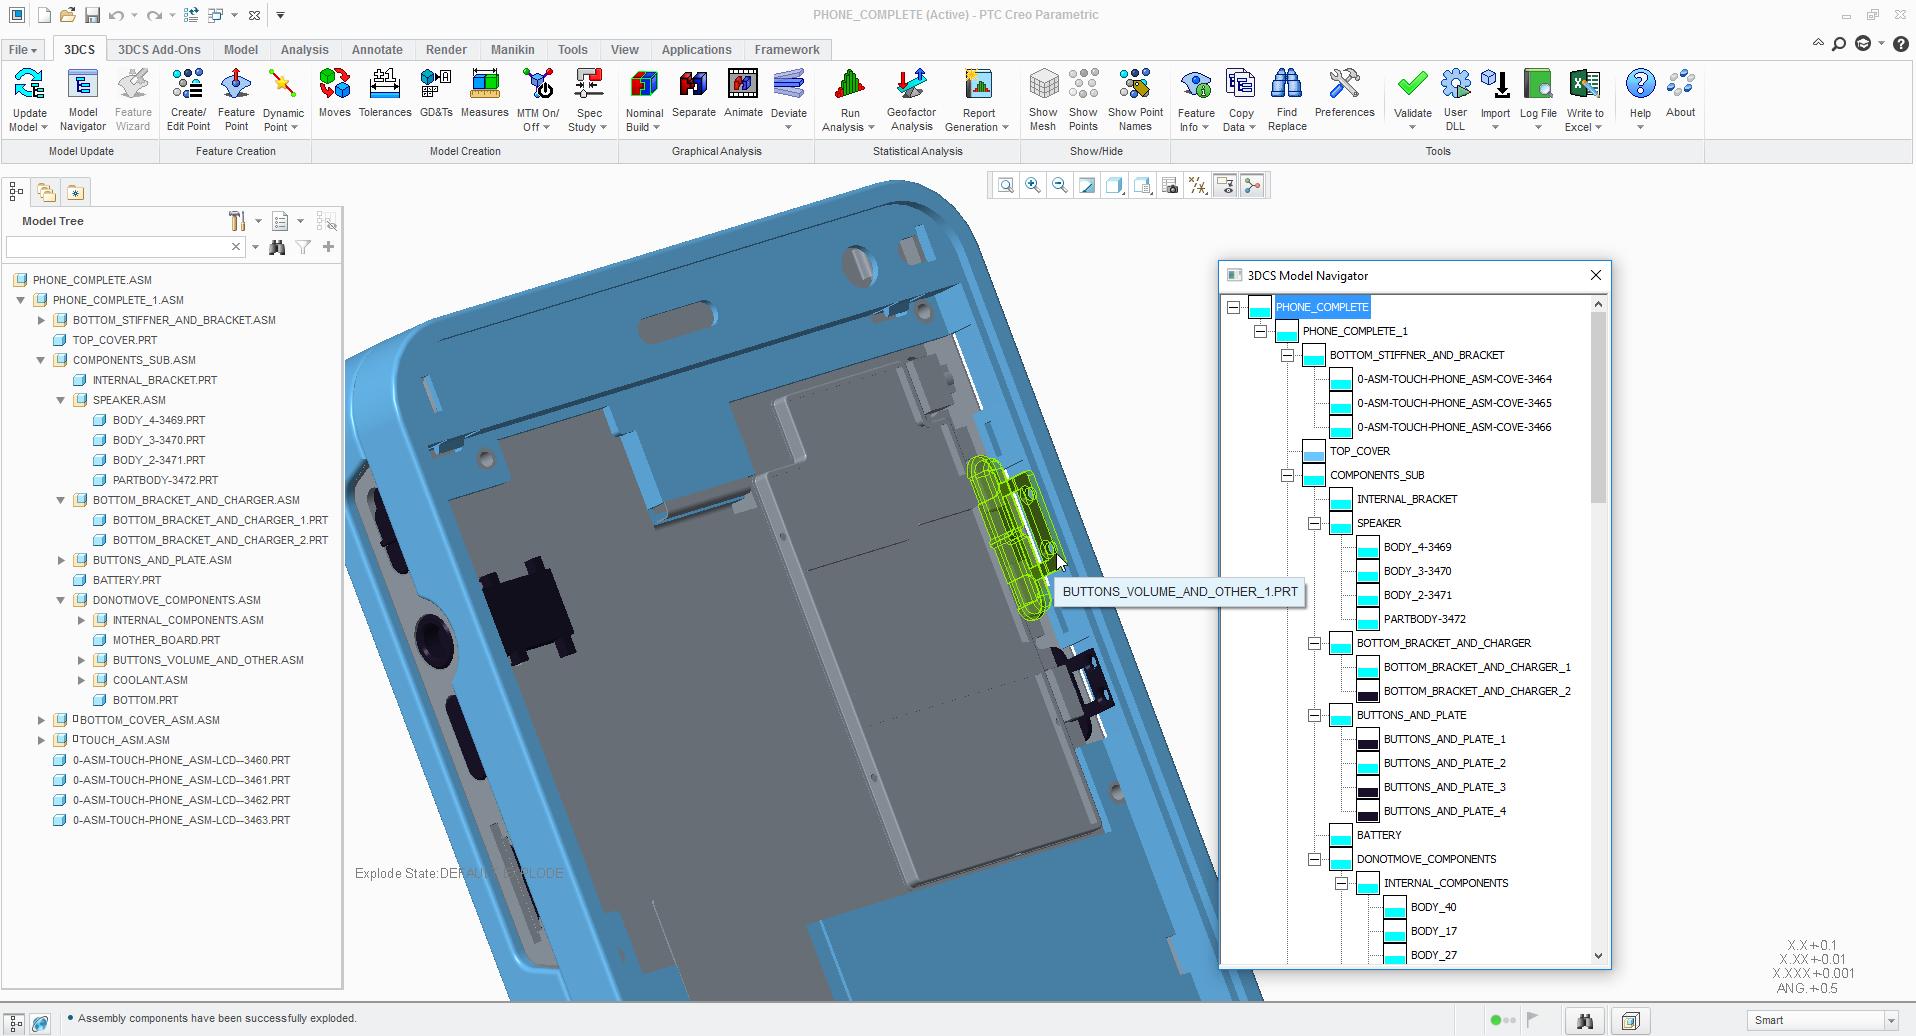 cell phone analysis - 3DCS integrated in PTC Creo Parametric